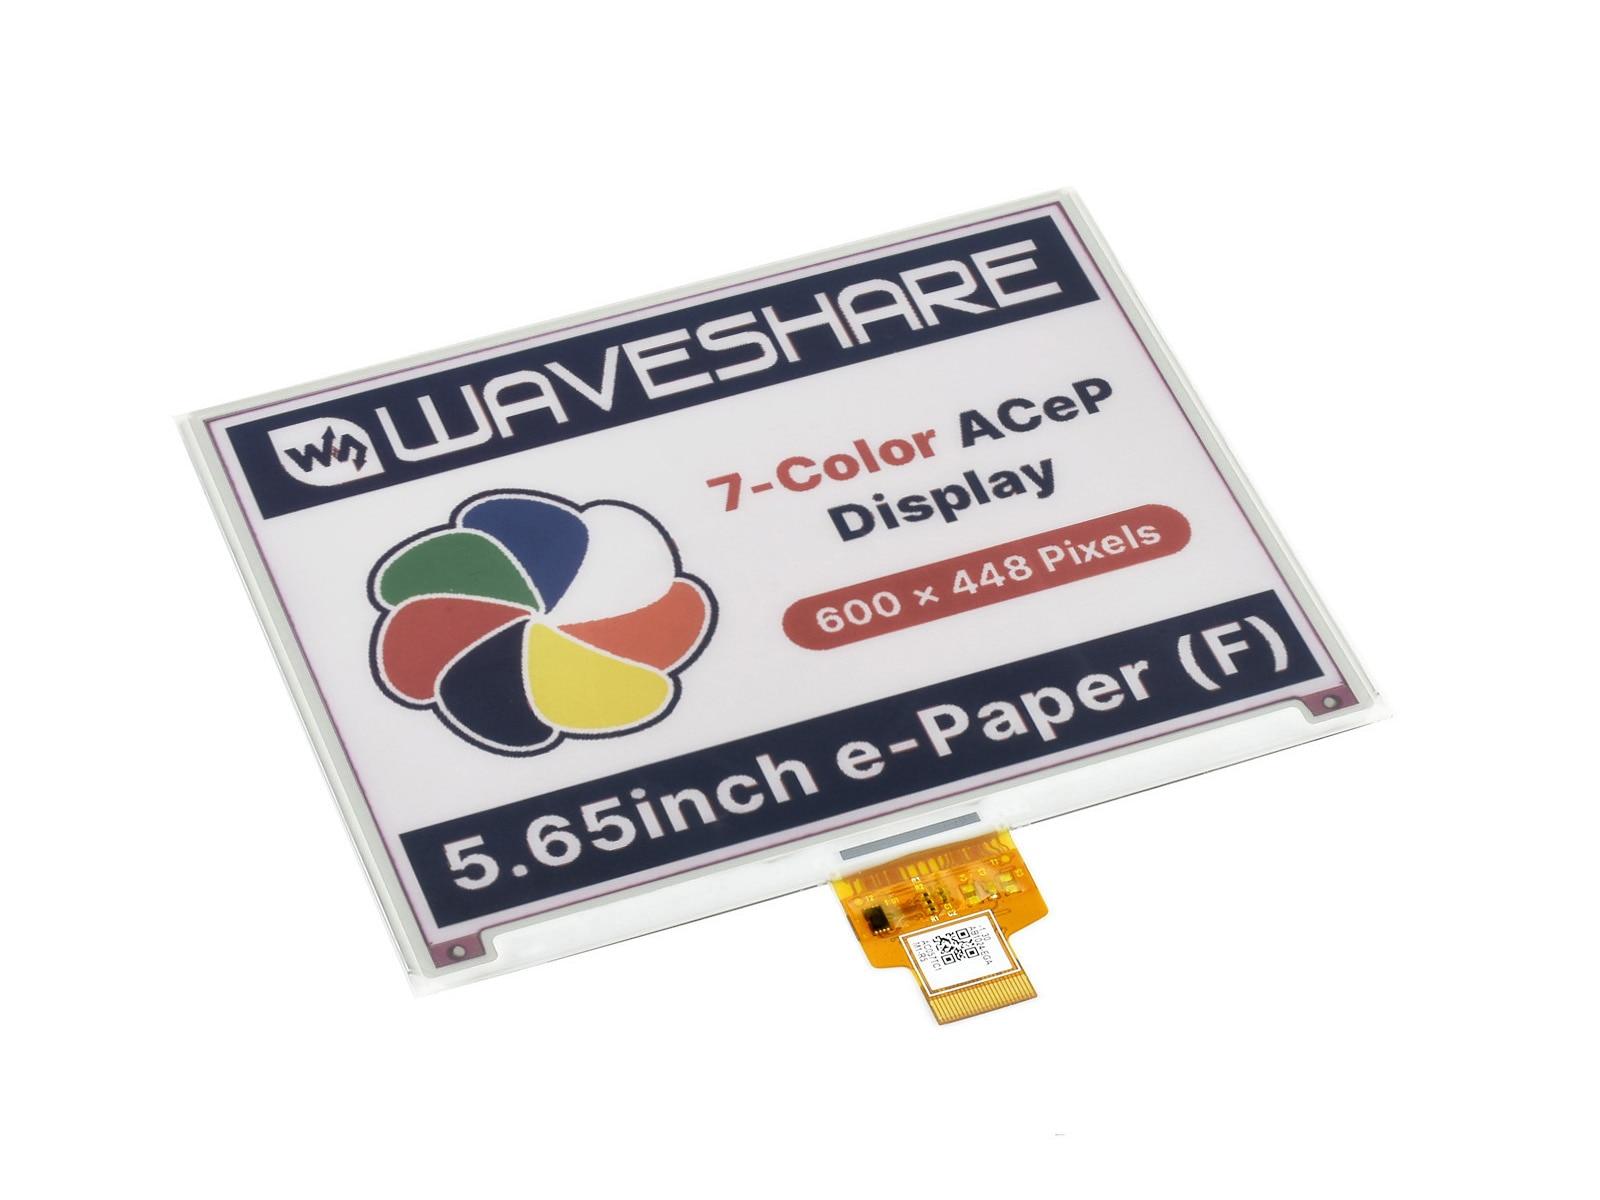 wavesare tela e ink bruto de papel eletronico 565 polegadas 600x448 pixels acep 7 cores sem pcb